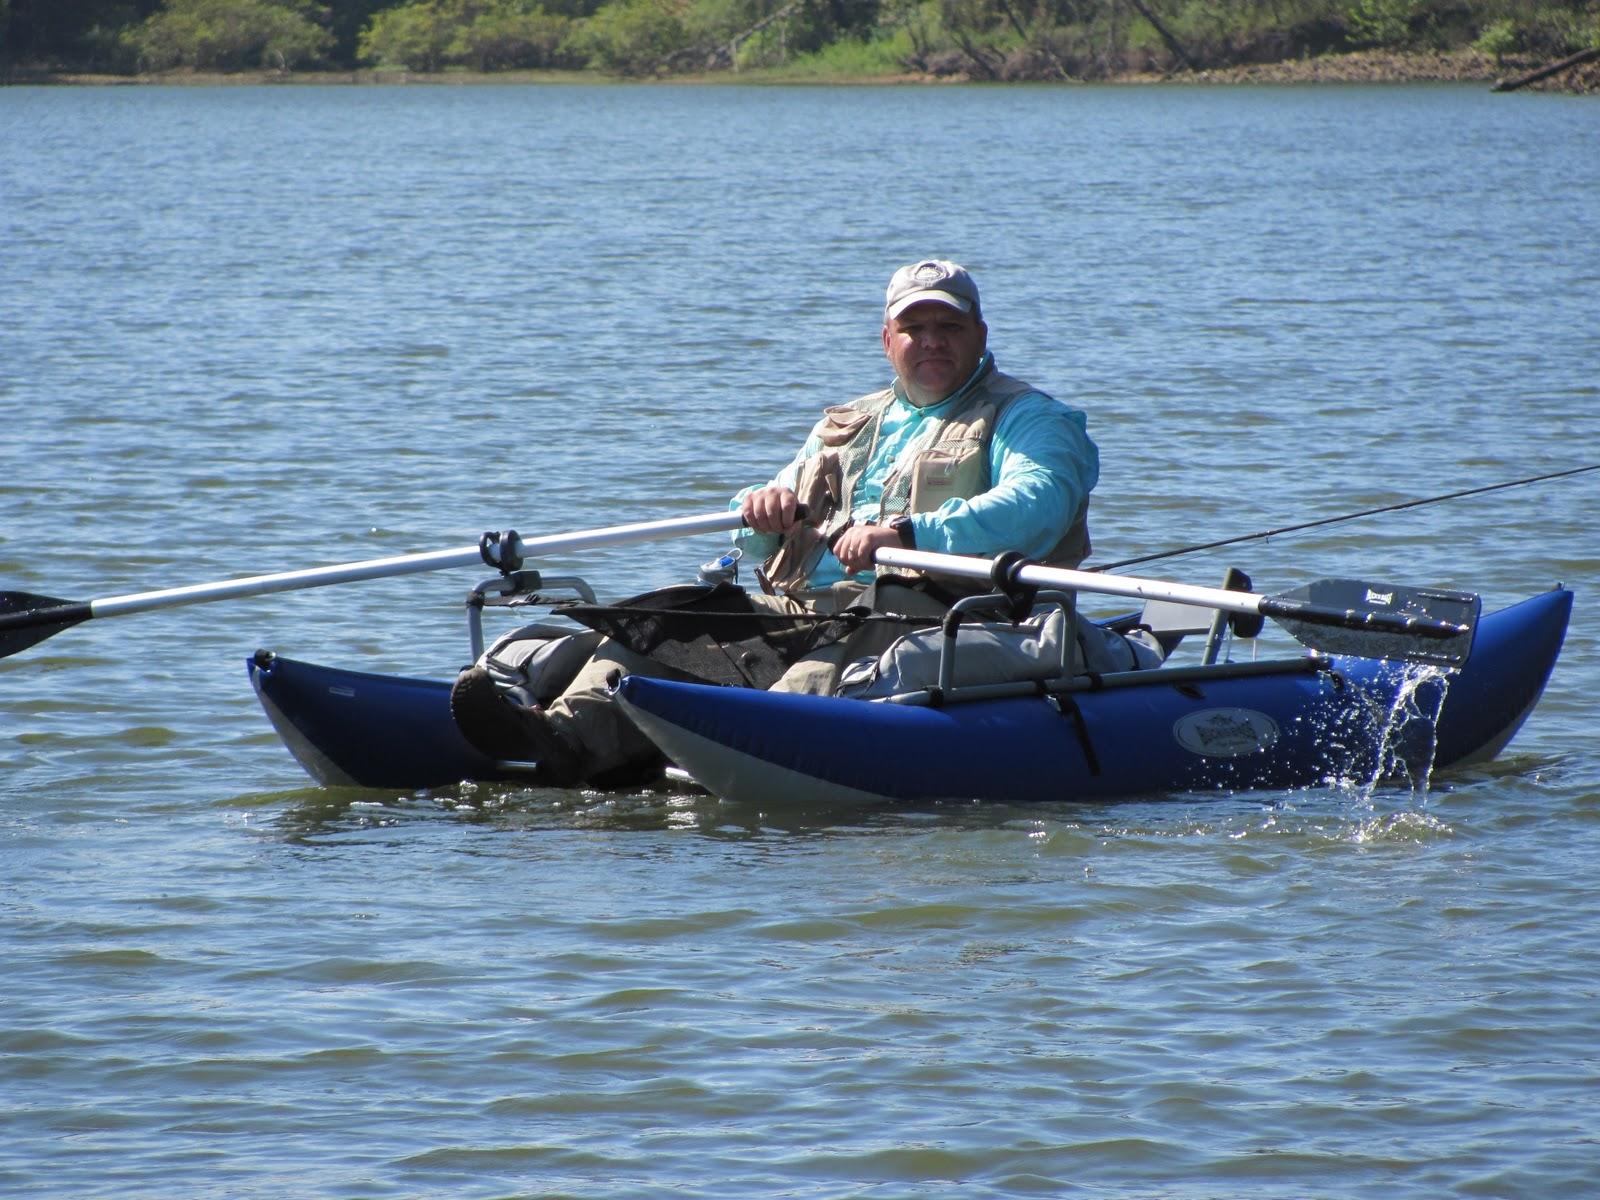 Ribolov na fotkama BC+Fishing